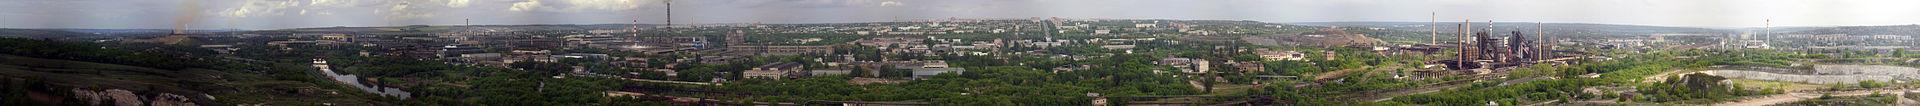 Панорама города Краматорск